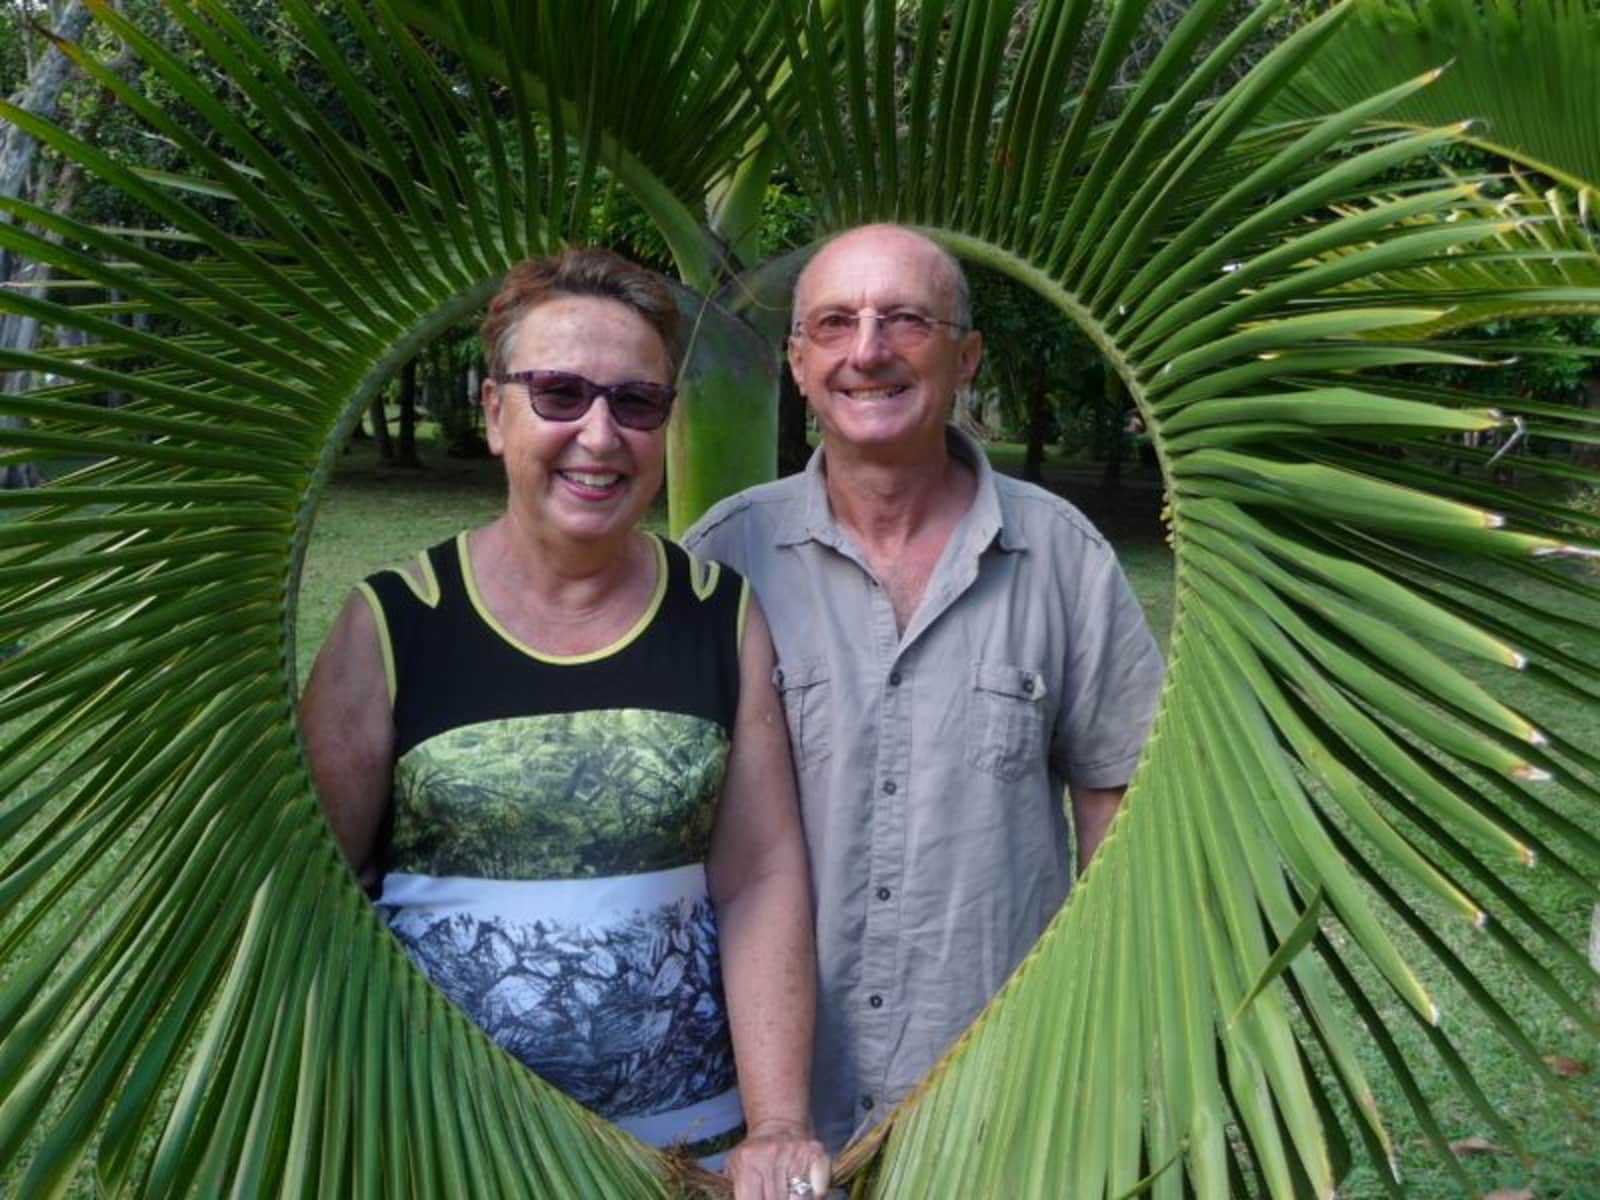 Chantal & Gilbert from Voiron, France